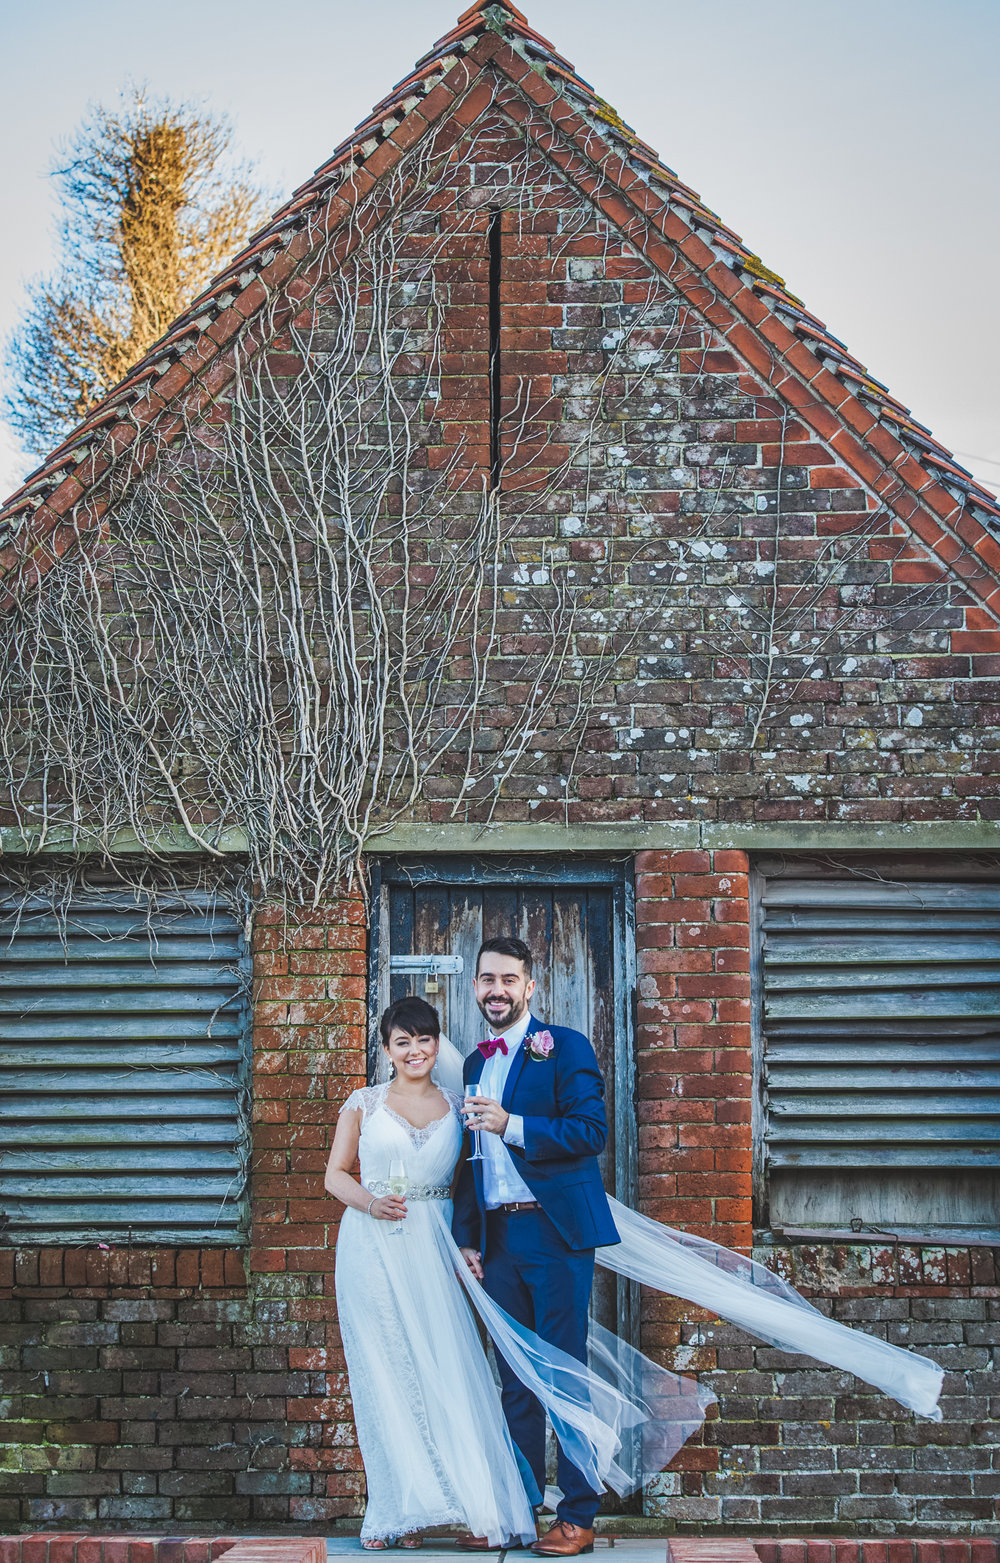 sussex wedding photographer, hayley rose photography, alternative, reportage wedding-12.jpg